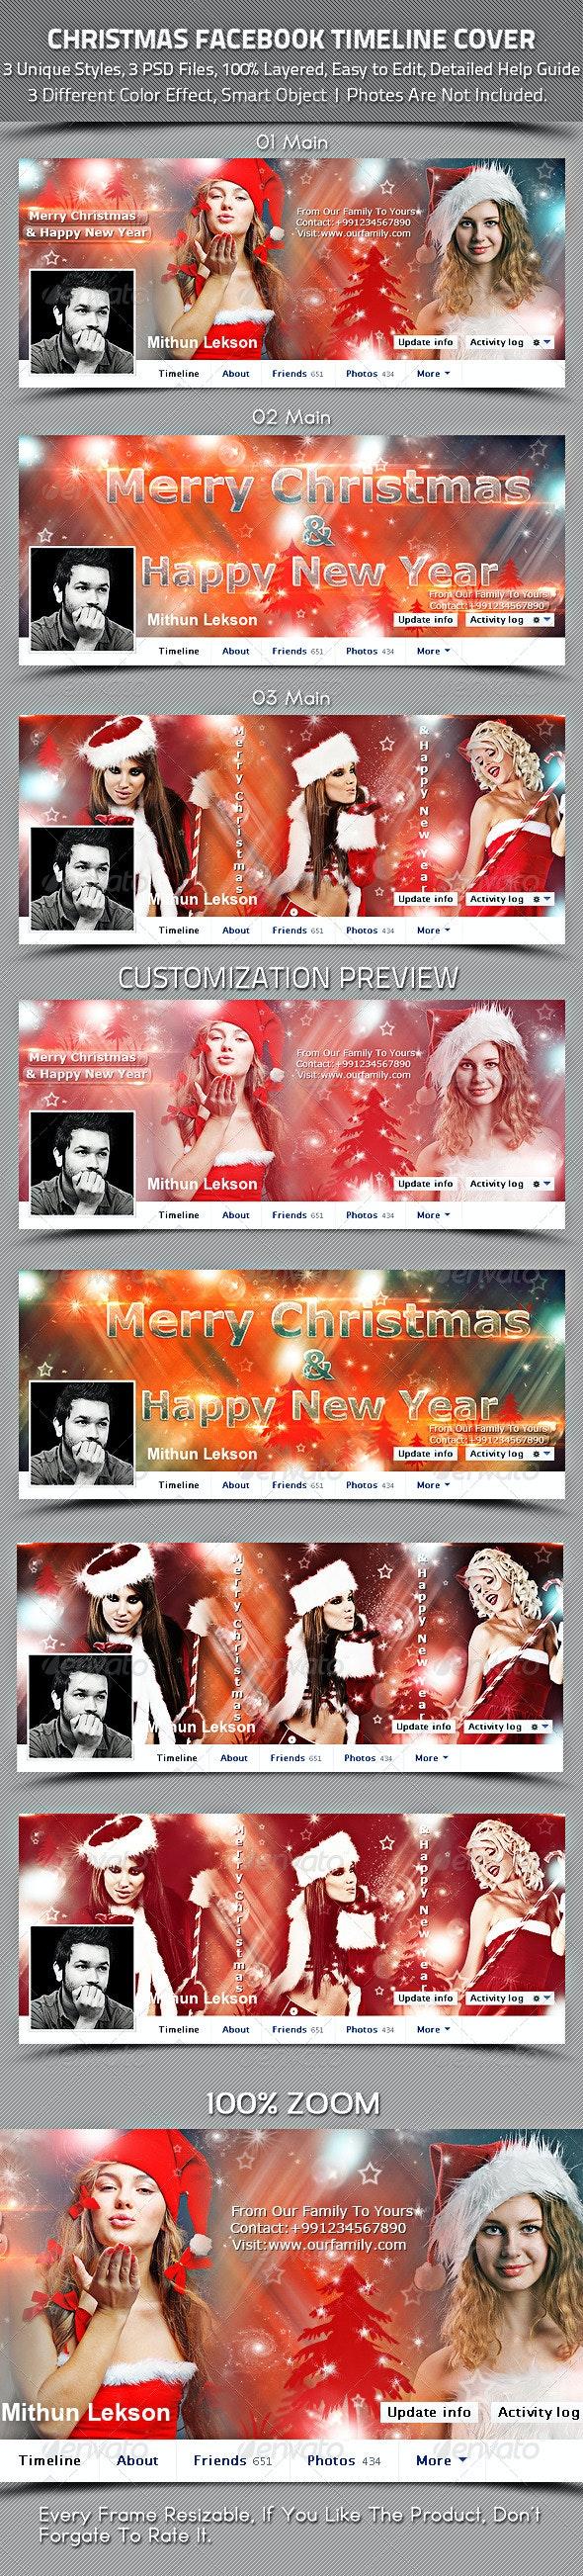 Christmas Facebook Timeline Cover - Facebook Timeline Covers Social Media